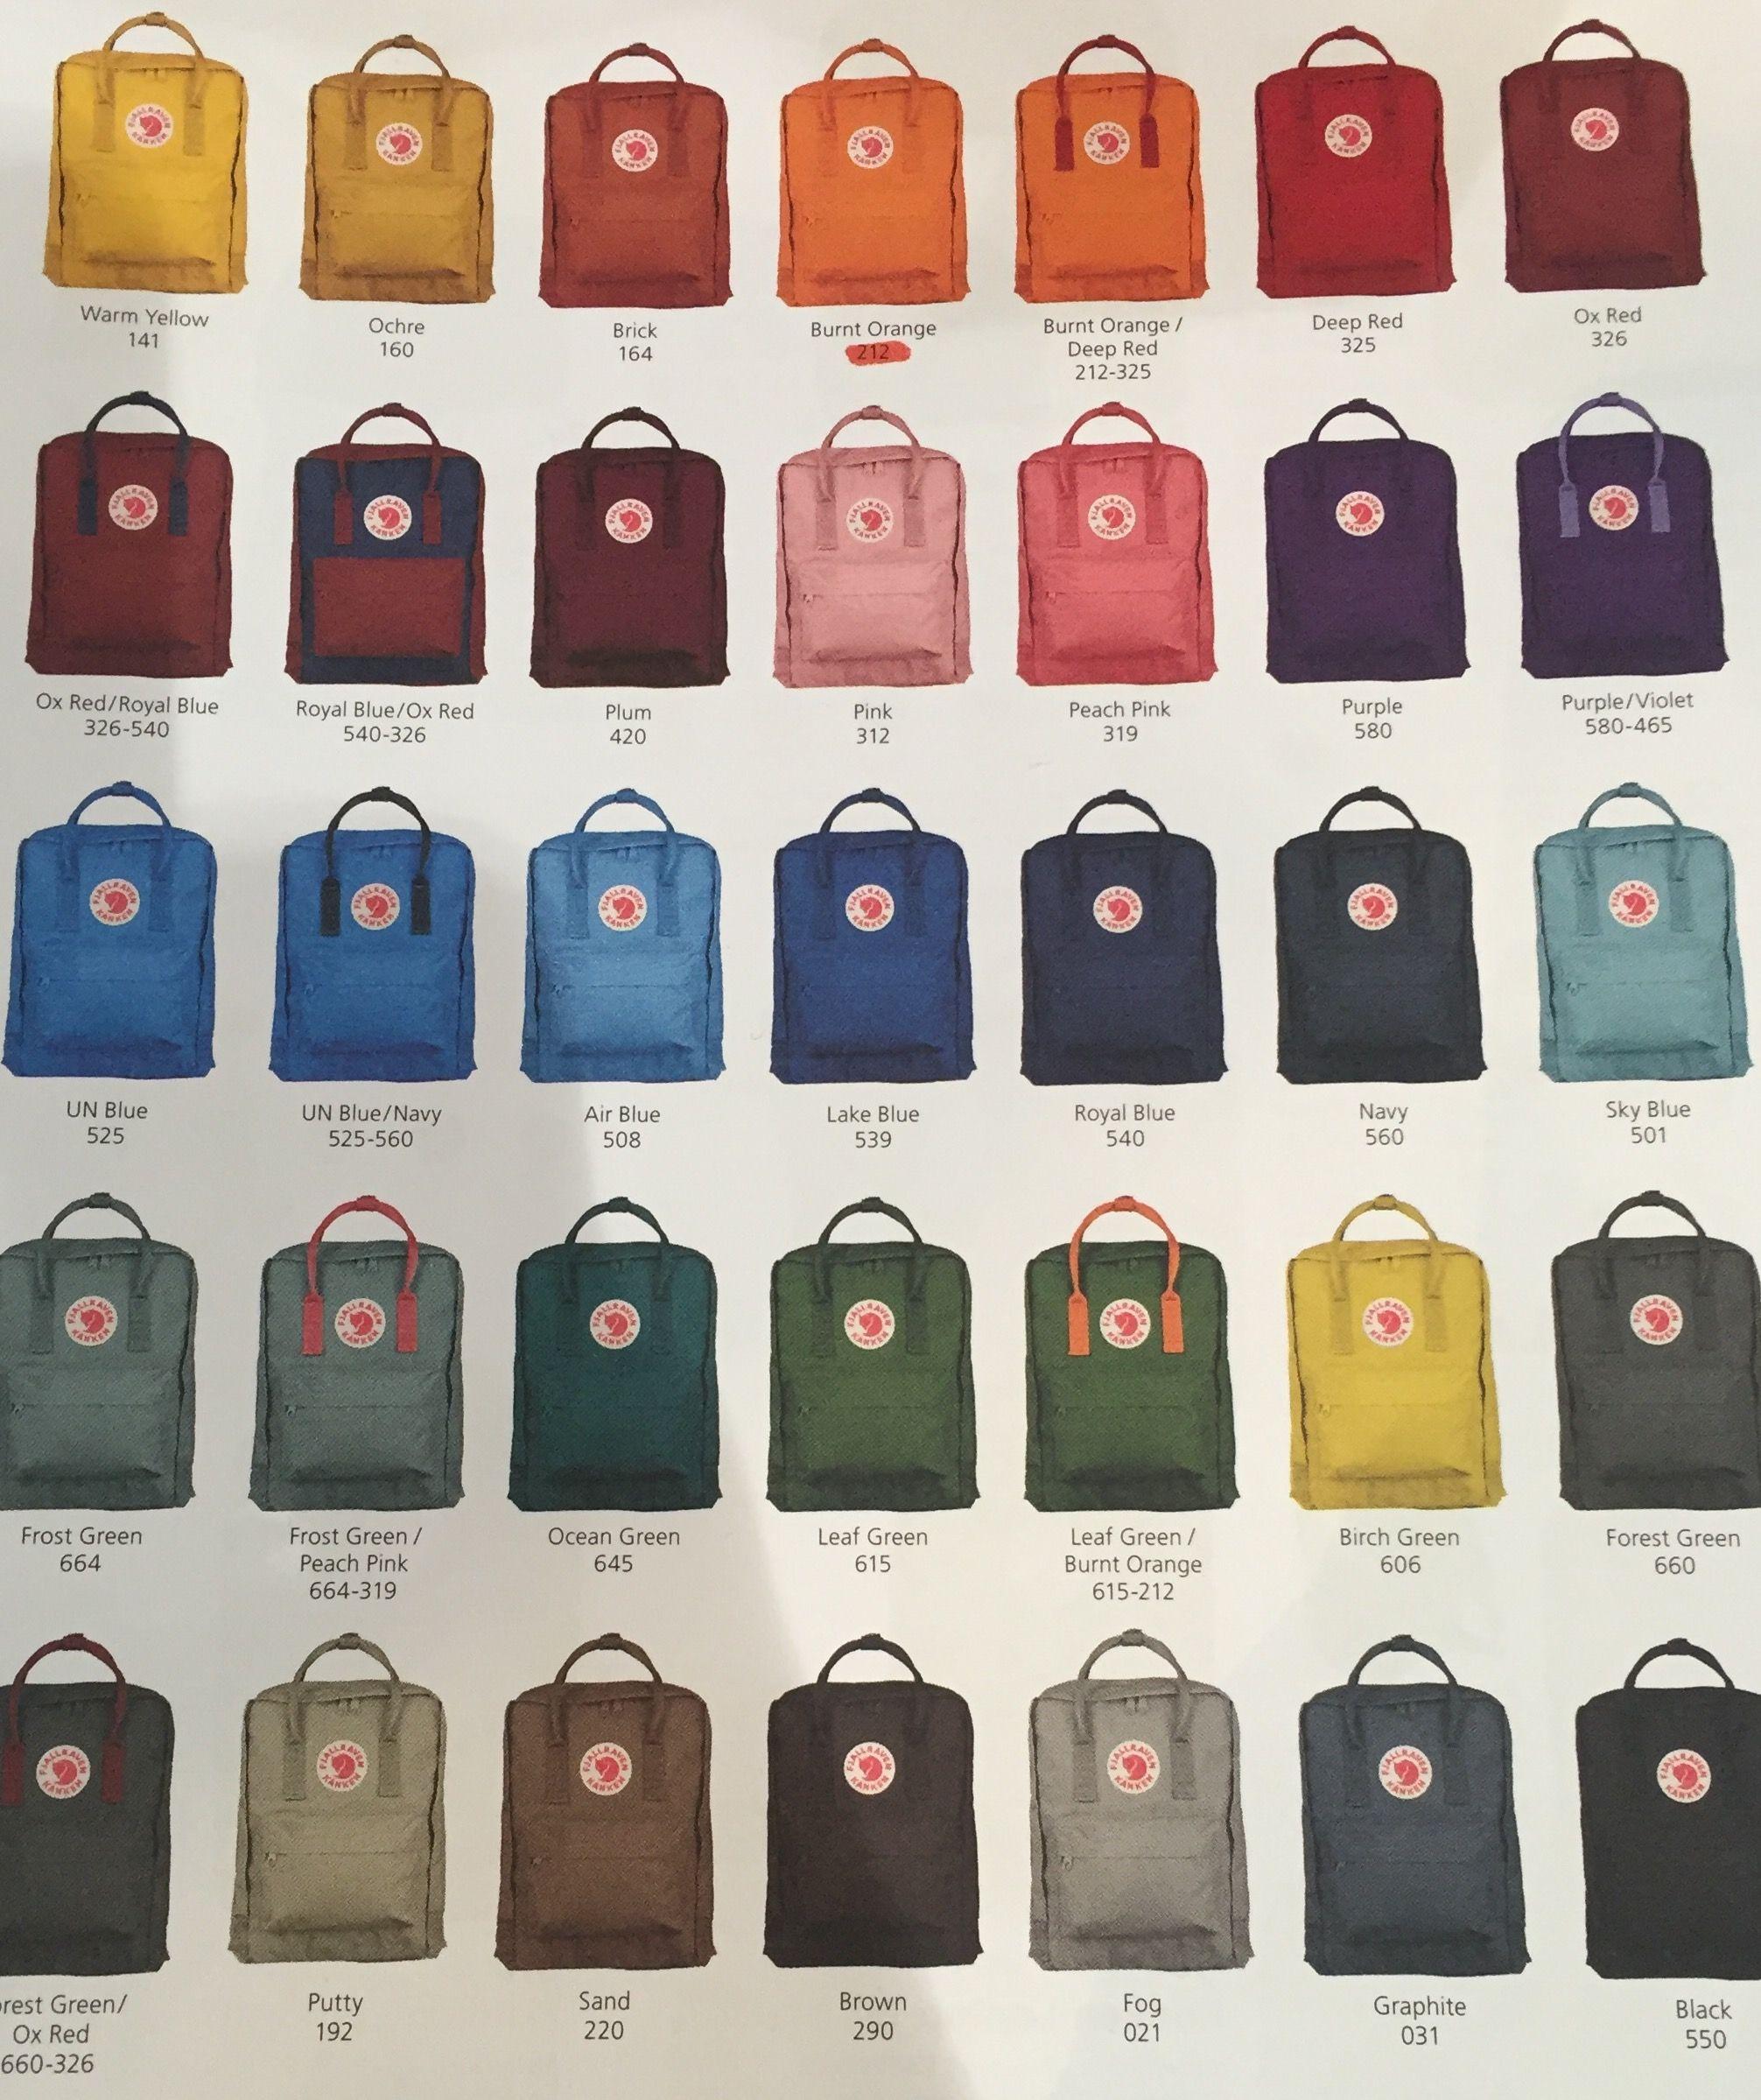 Fjallraven Kanken Backpack Colors Torby Rzeczy Do Szkoly I Torebki